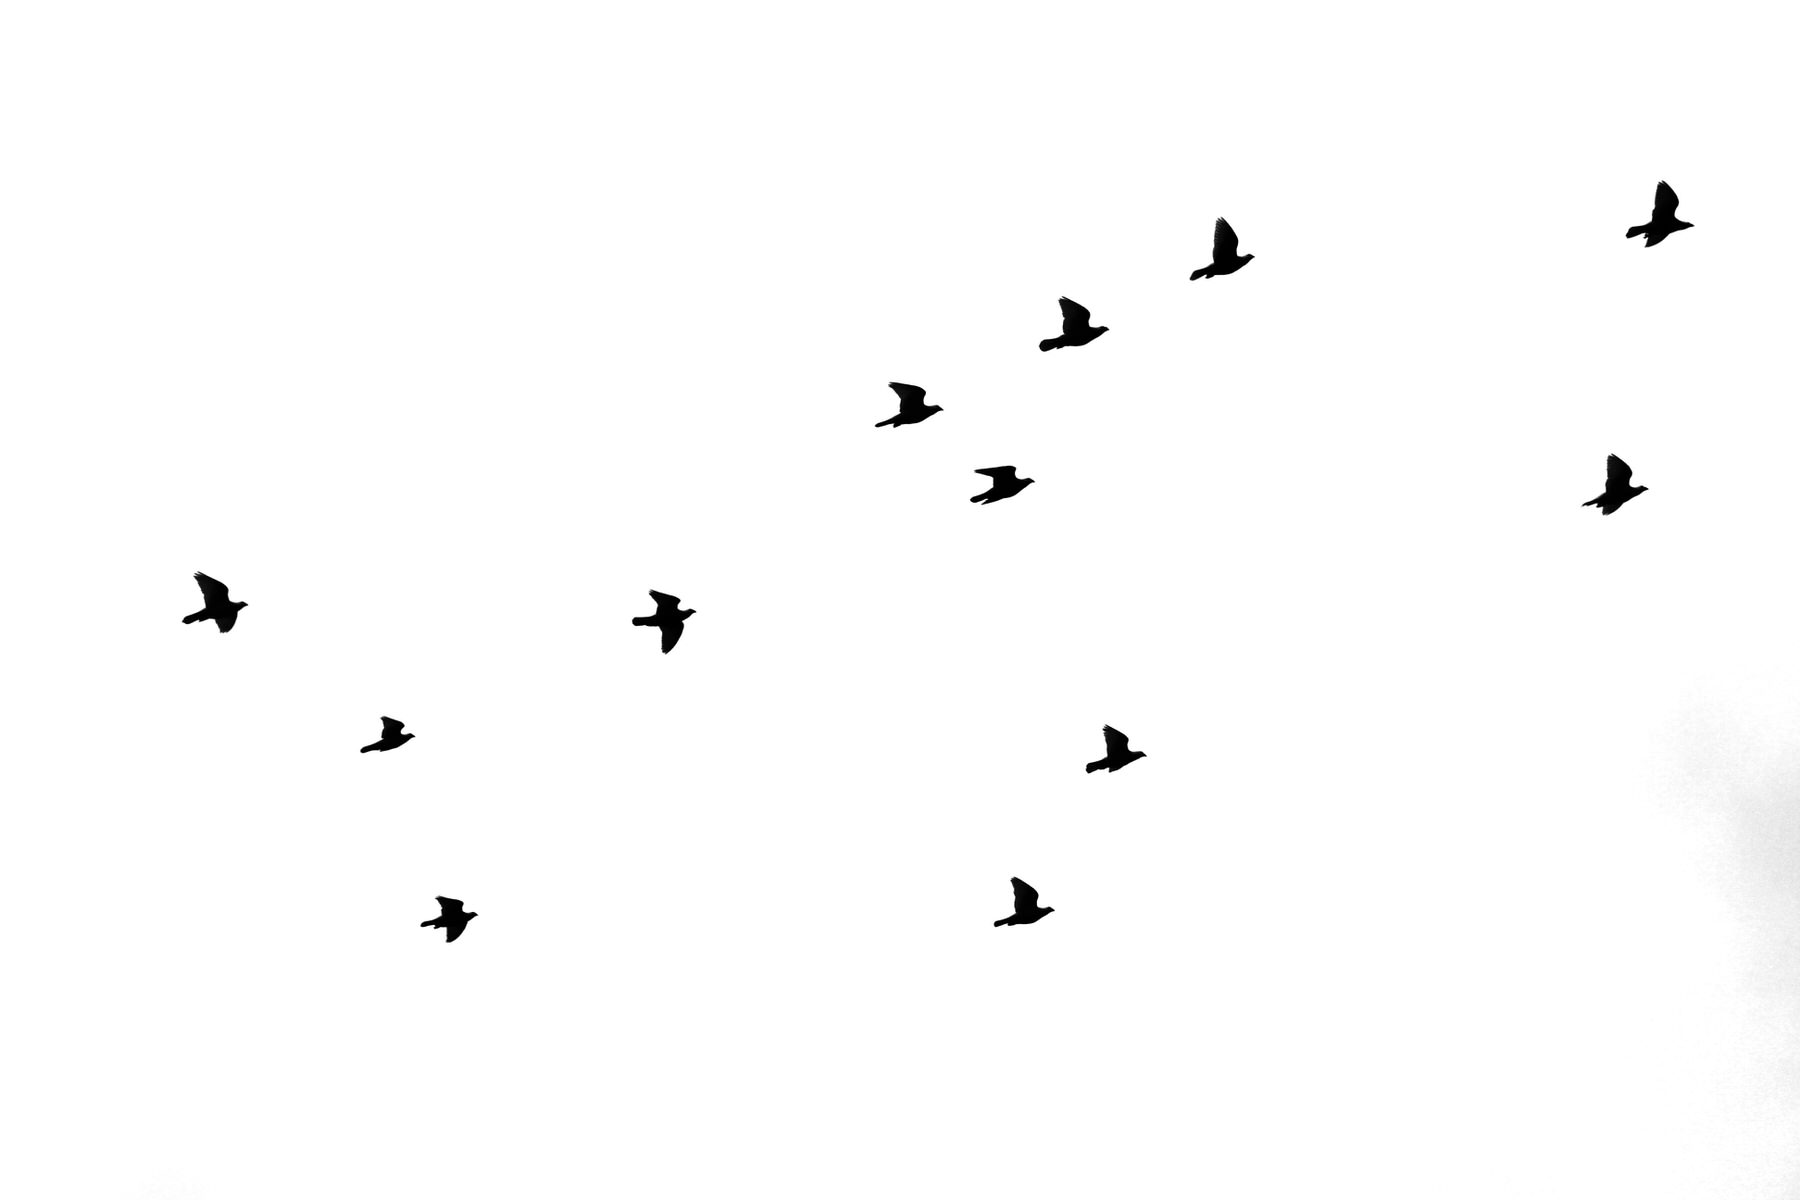 oiseaux-envol-dans-la-joie